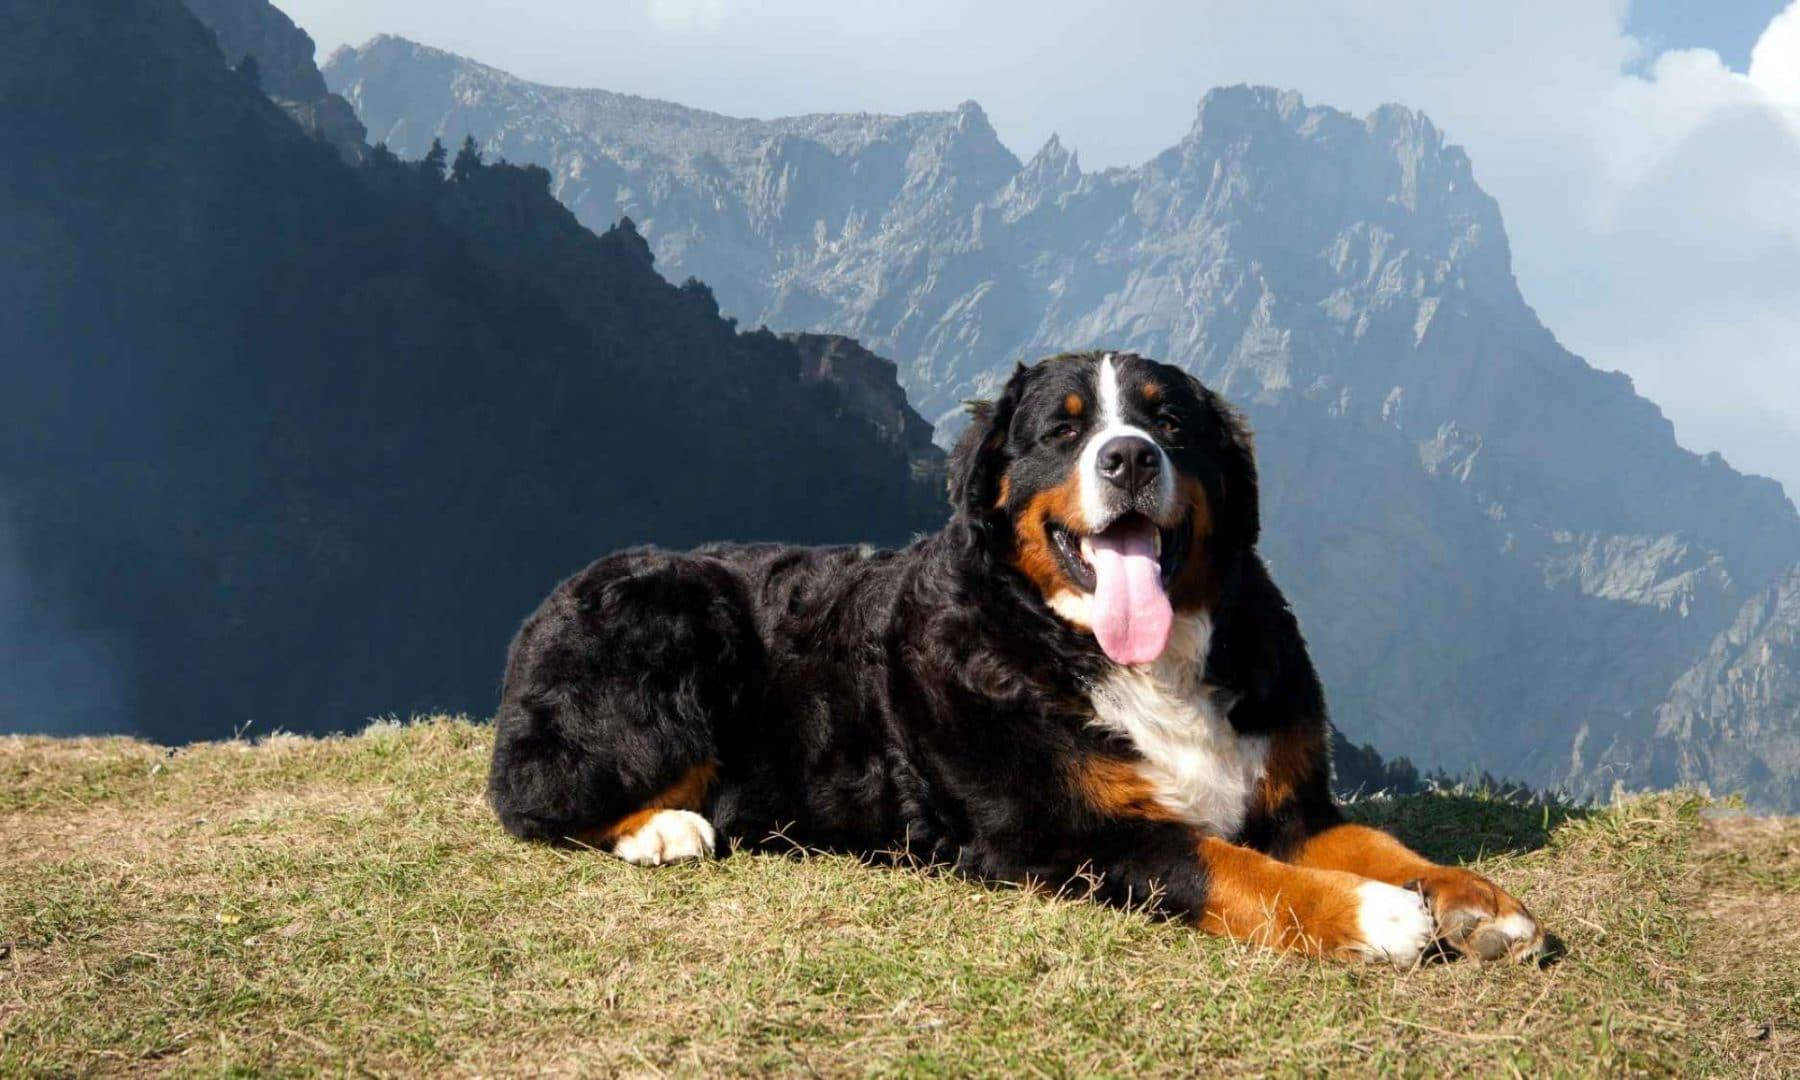 Зенненхунд. описание, особенности, цена и уход за зенненхундом   животный мир